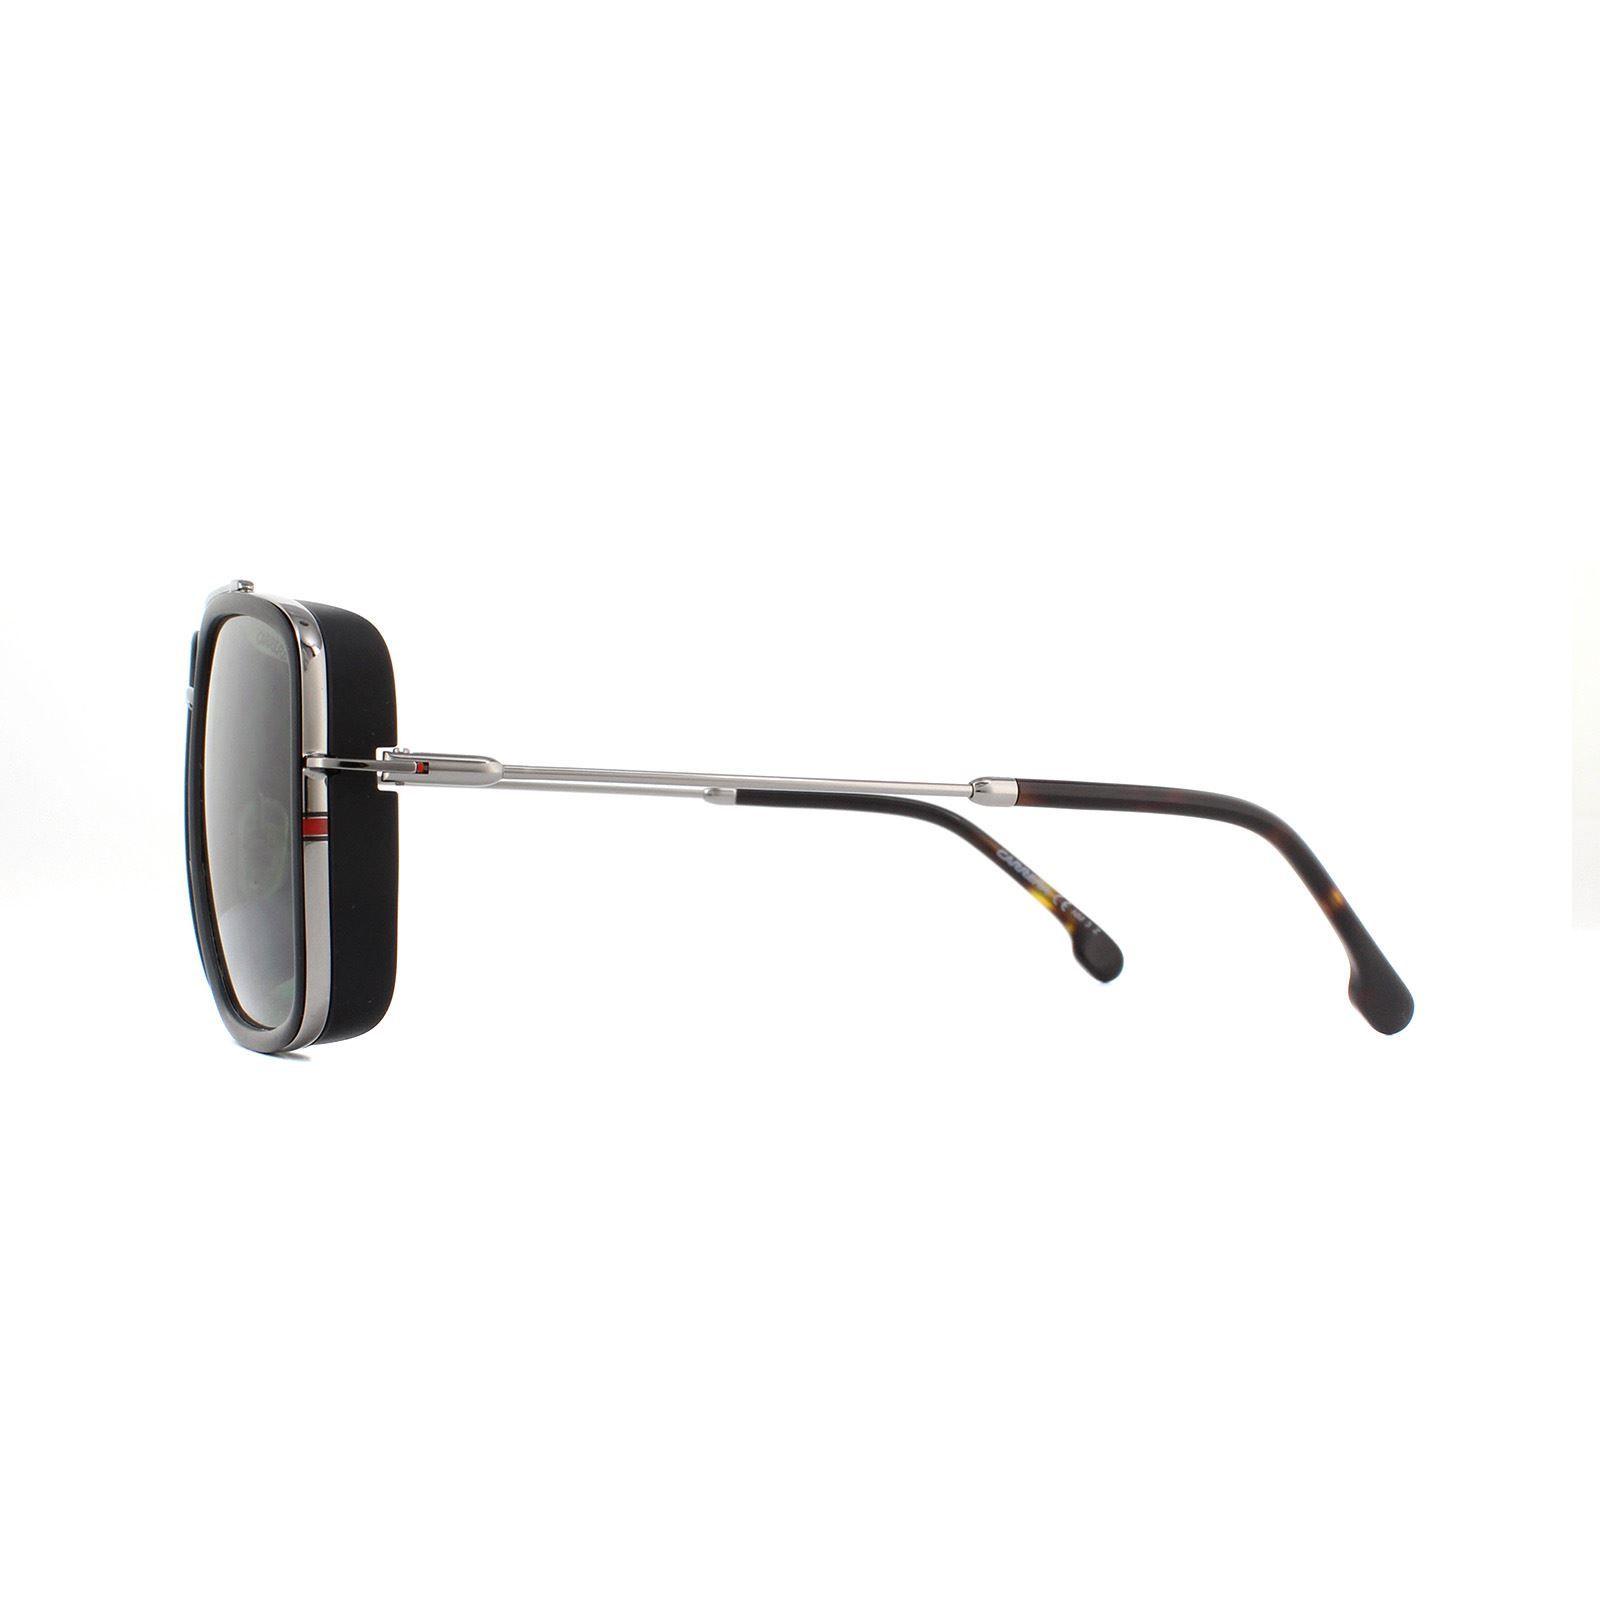 Carrera Sunglasses 207/S 6LB UC Ruthenium Green Polarized